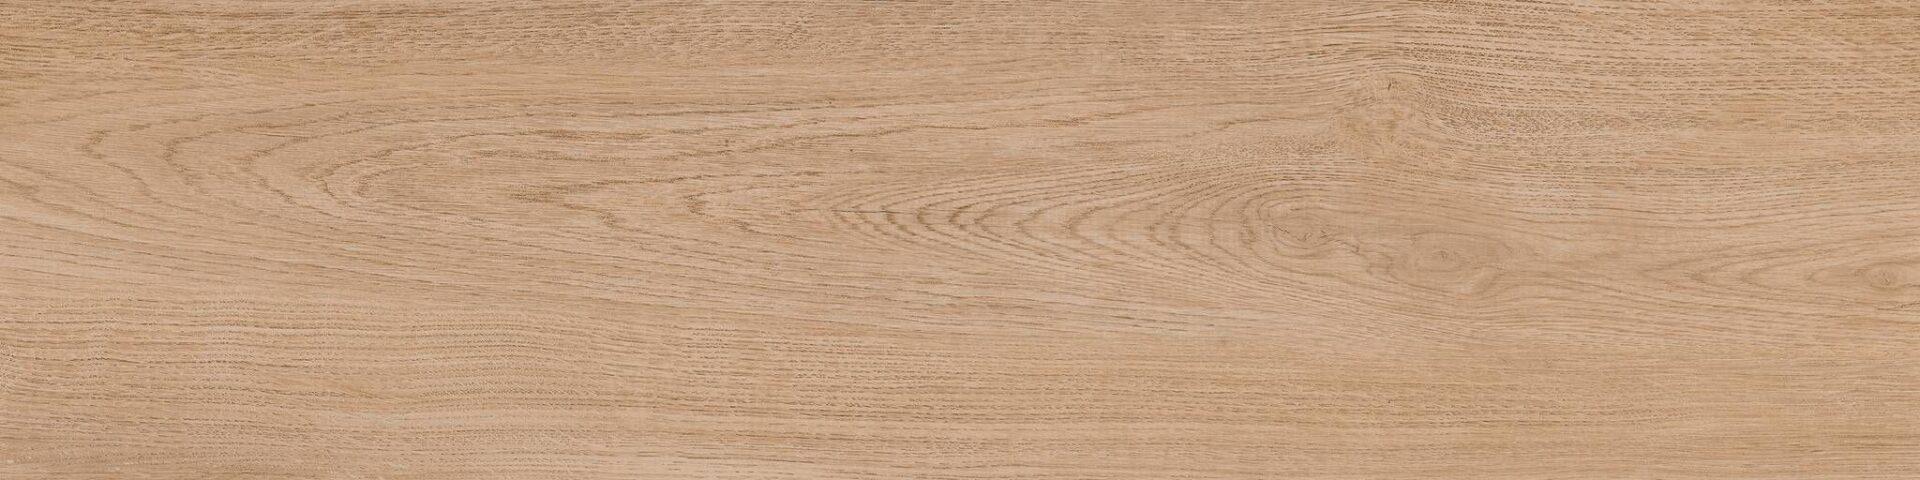 BAVARO MIEL Wall/Floor Ideas Granite Solarius Premium Natural Stones Countertops